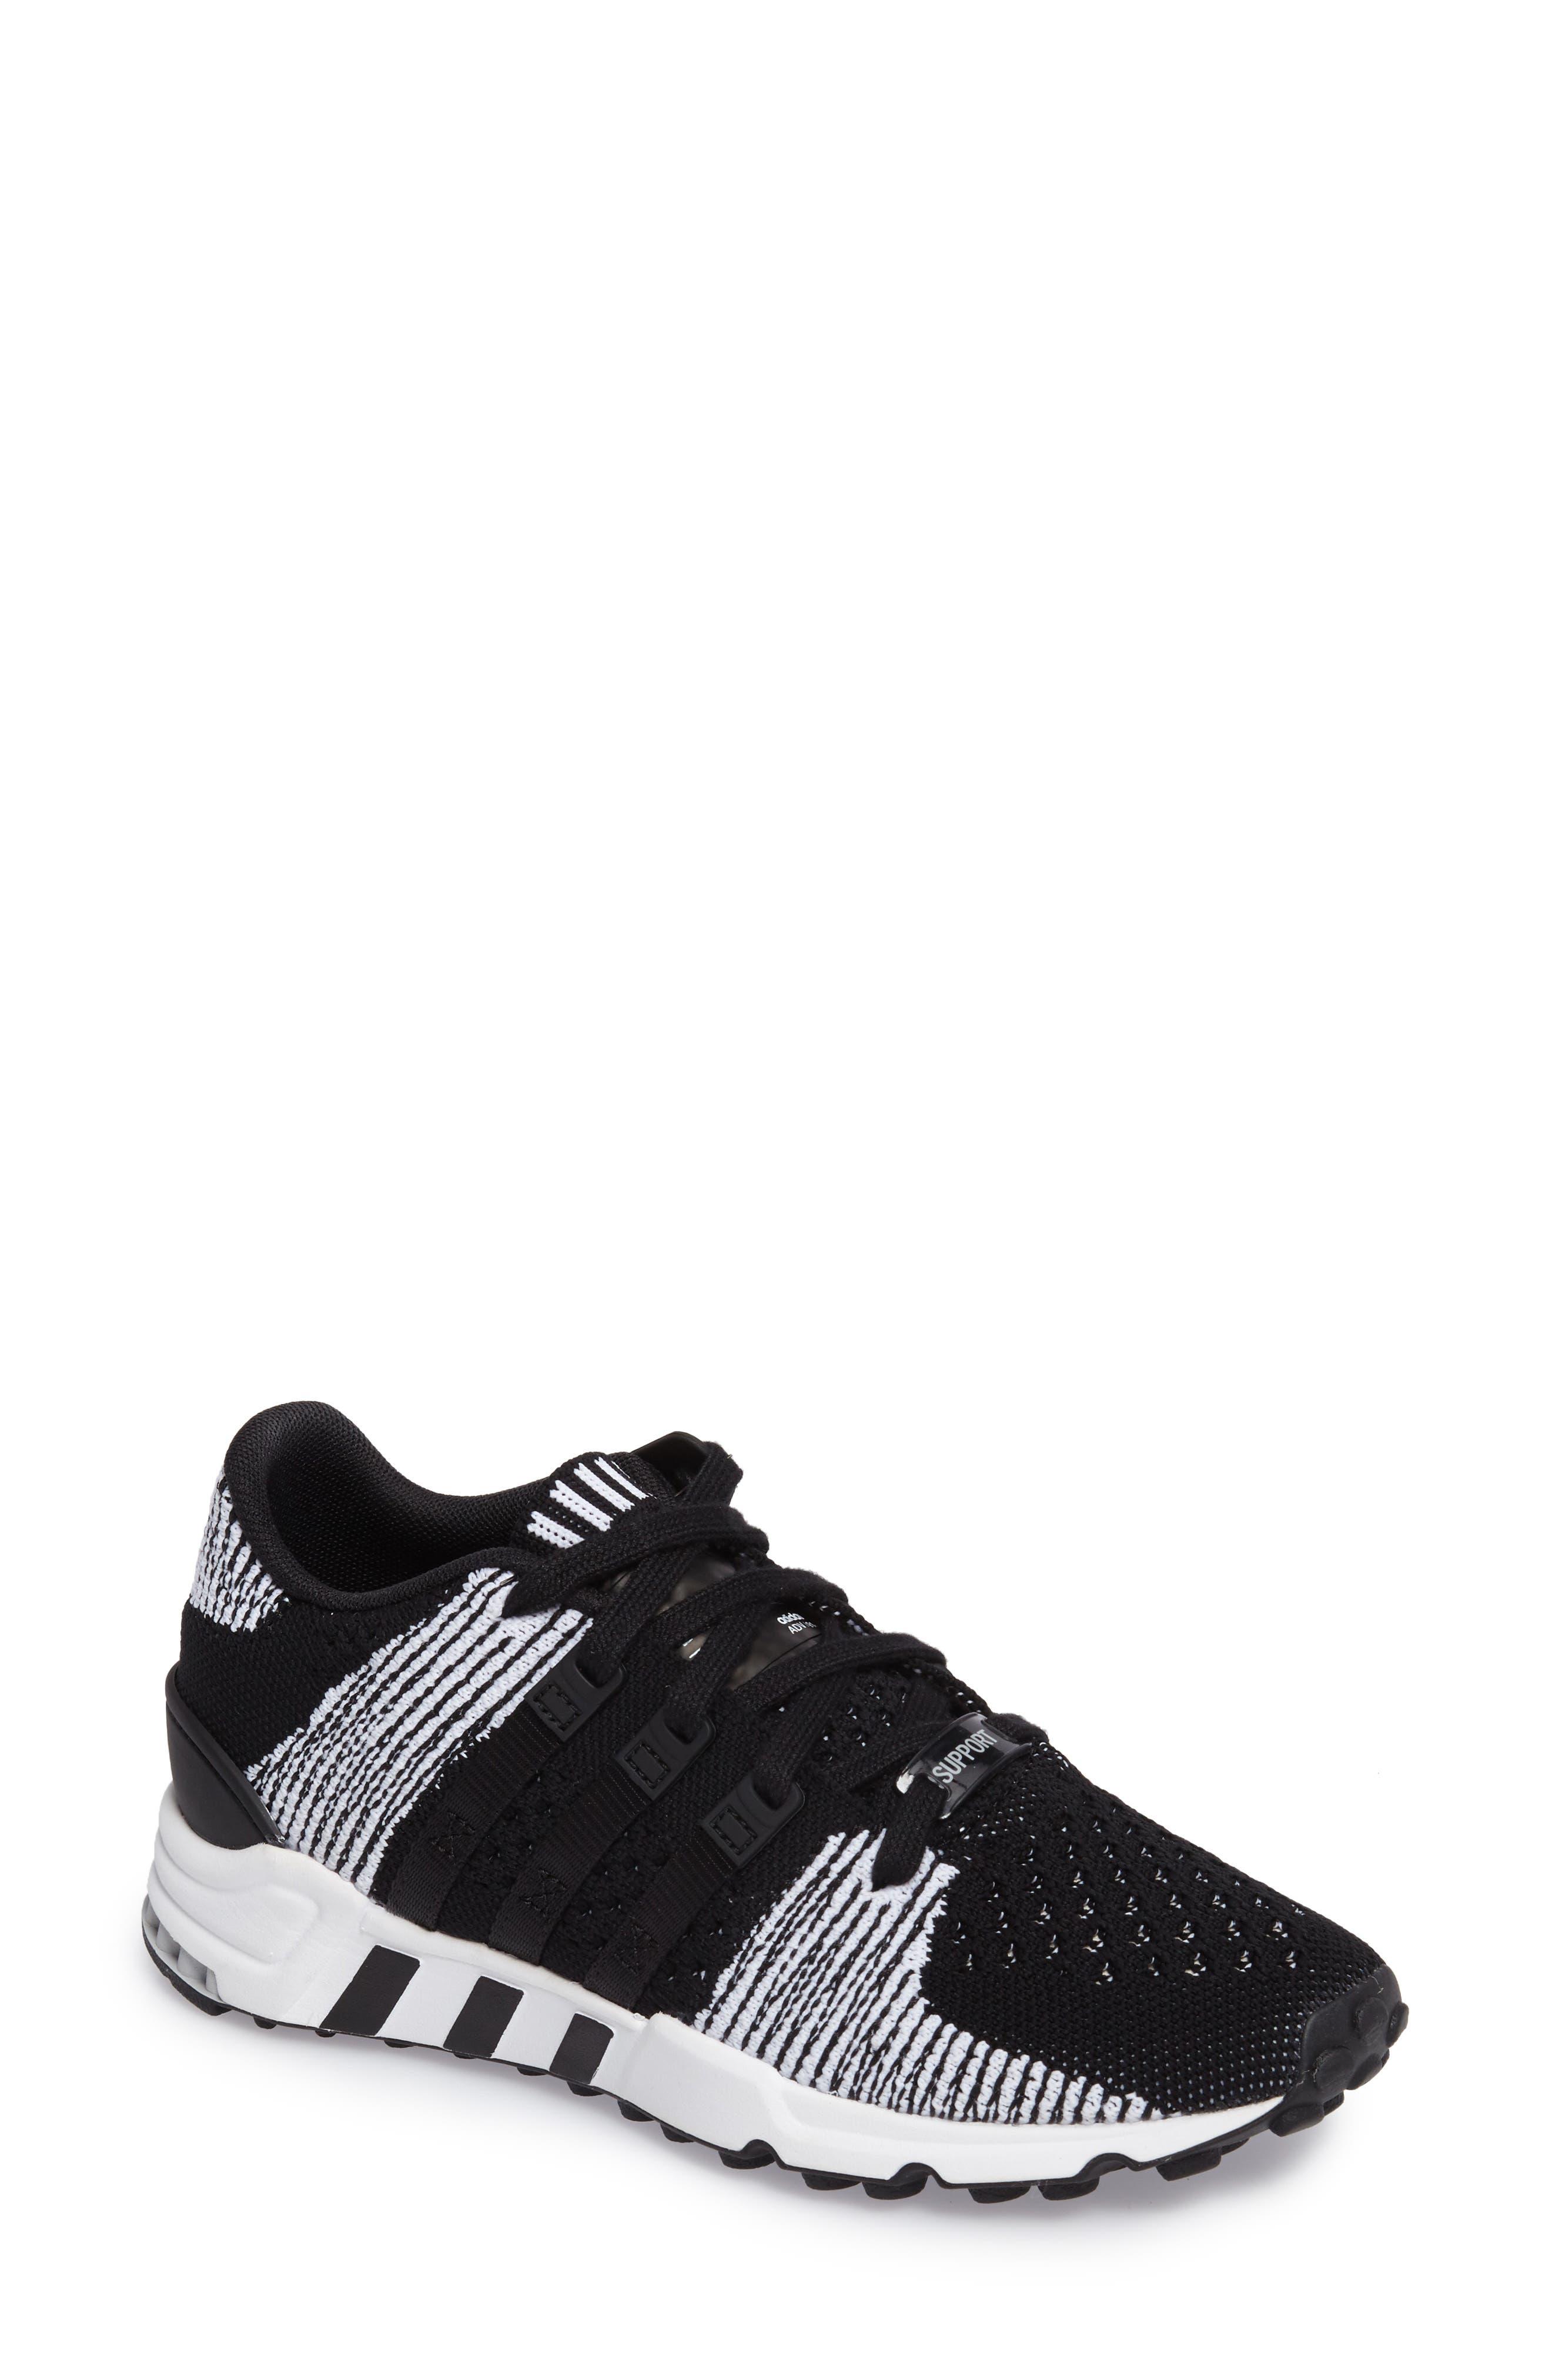 Main Image - adidas EQT Support RF PK Sneaker (Women)